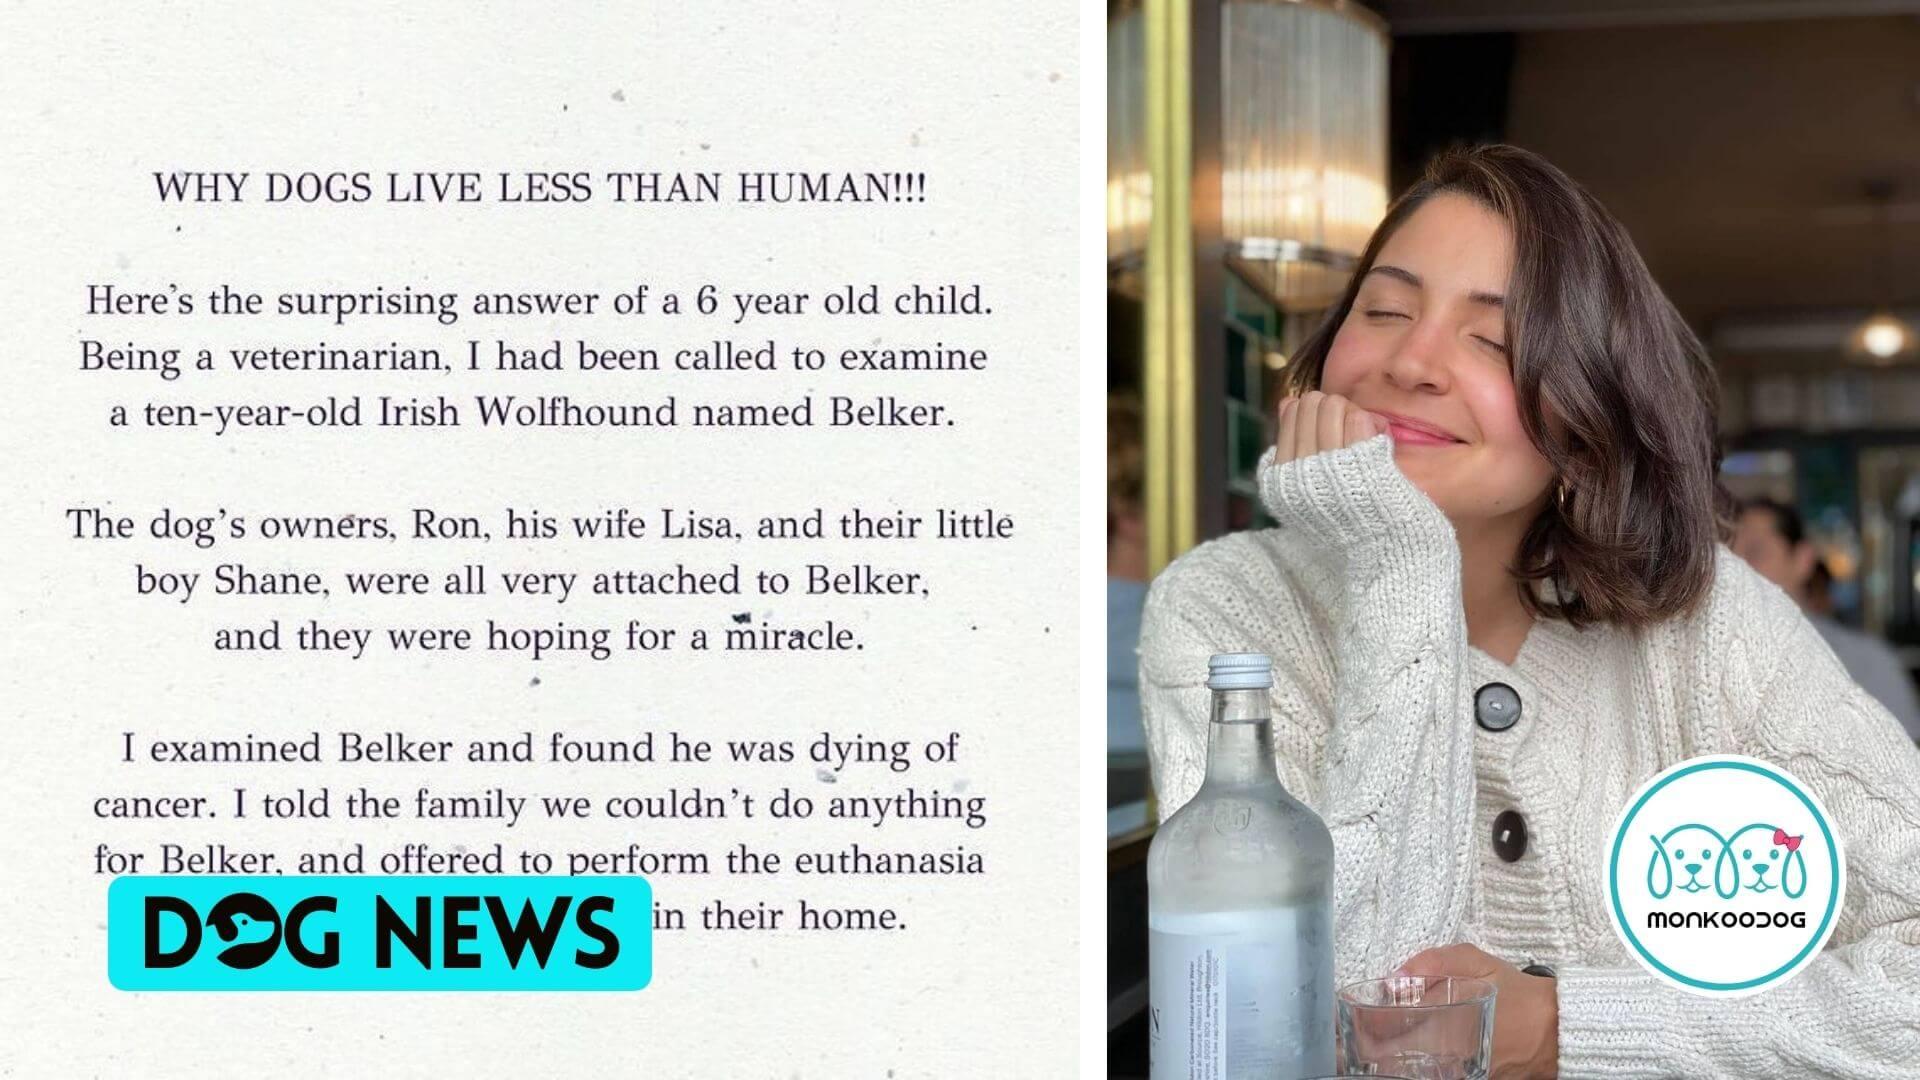 Anushka Sharma heartfelt post for pet owners